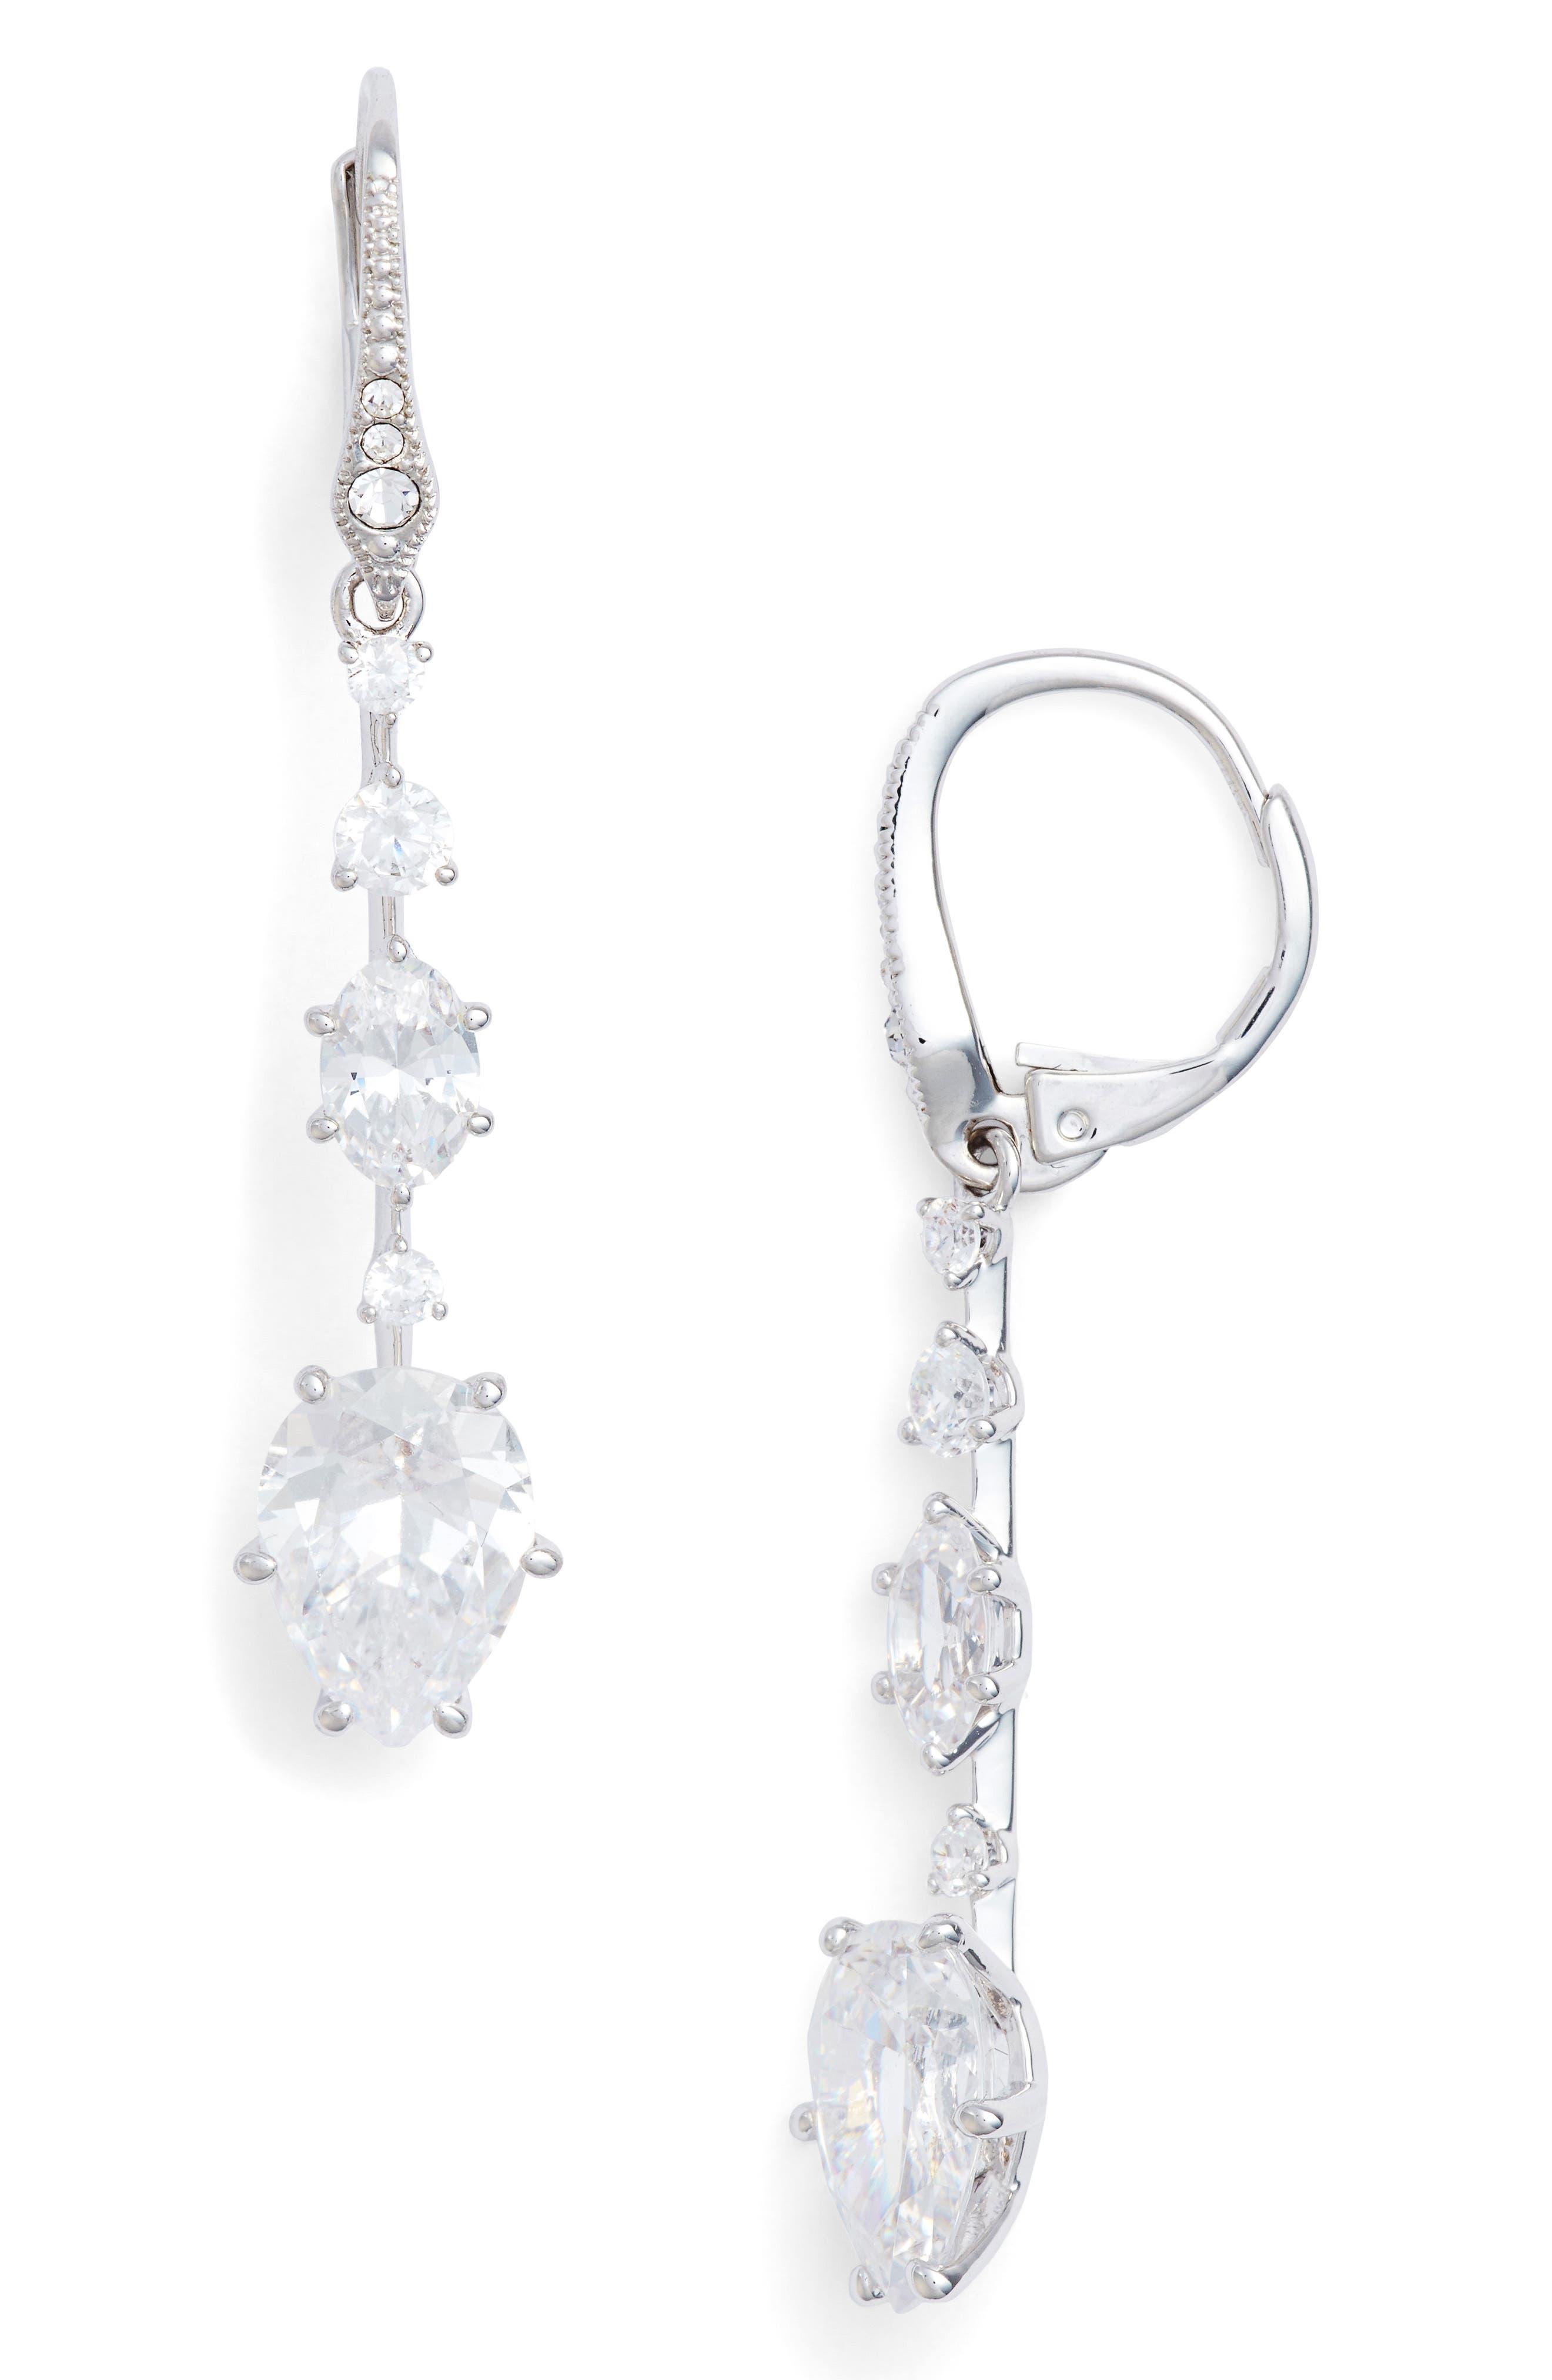 Main Image - Nadri Royale Cubic Zirconia Drop Earrings